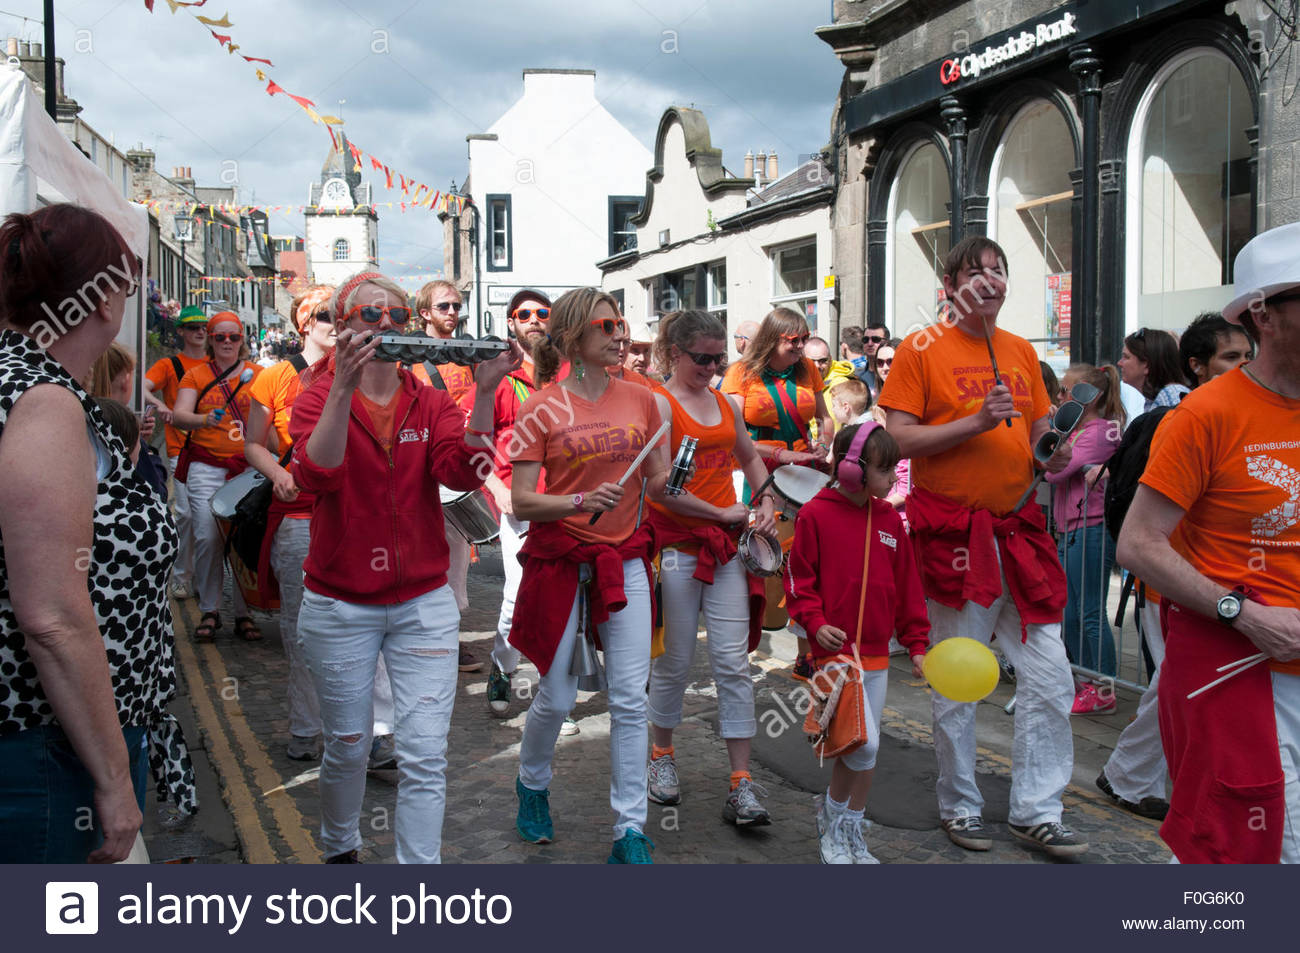 South Queensferry, UK. August 15, 2015.  Edinburgh Samba Band on the High Street. QueensferryÕs annual Fair - Stock Image